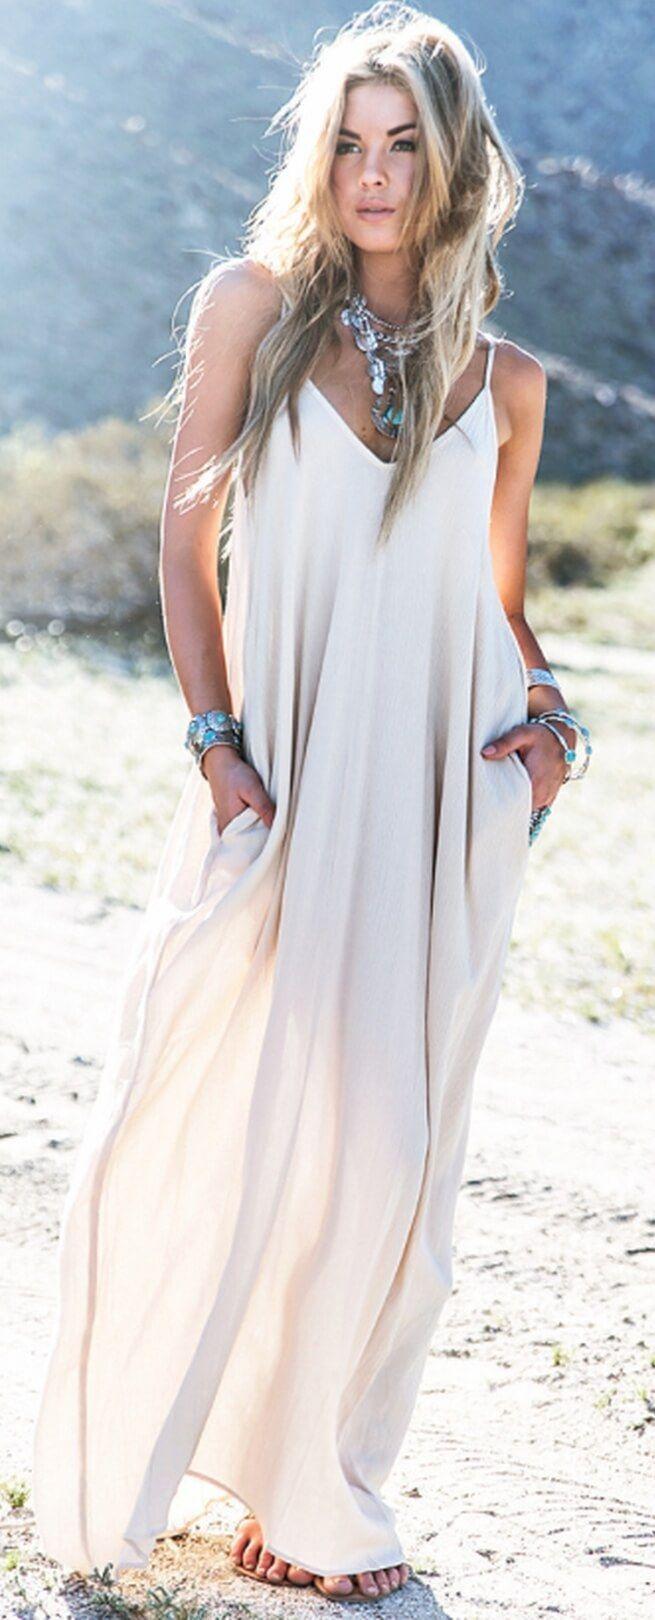 7877cf2ab8 Boho Chic Women Maxi Dress. Boho dresses. Beach fashion & Bohem ...